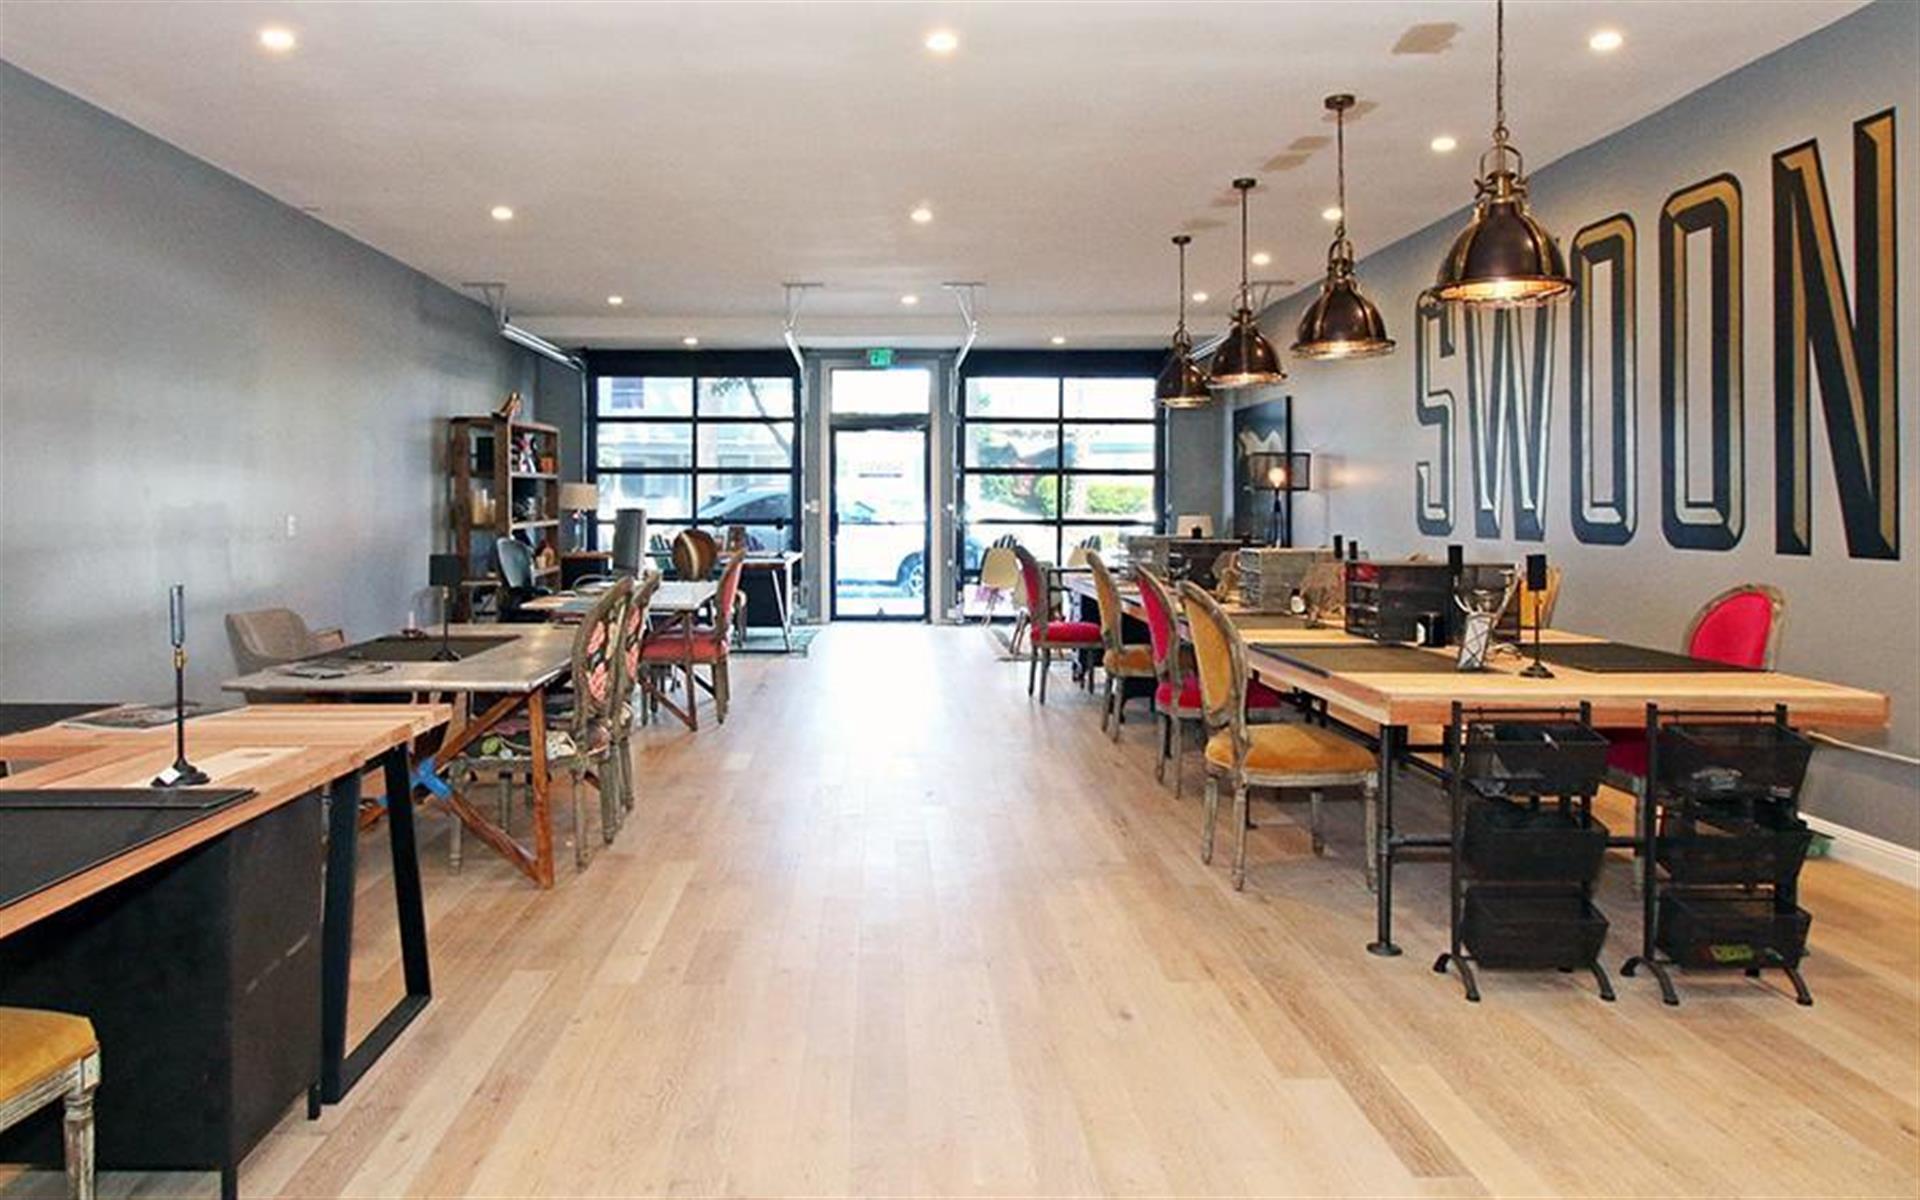 Swoon - Industrial Open Office Space